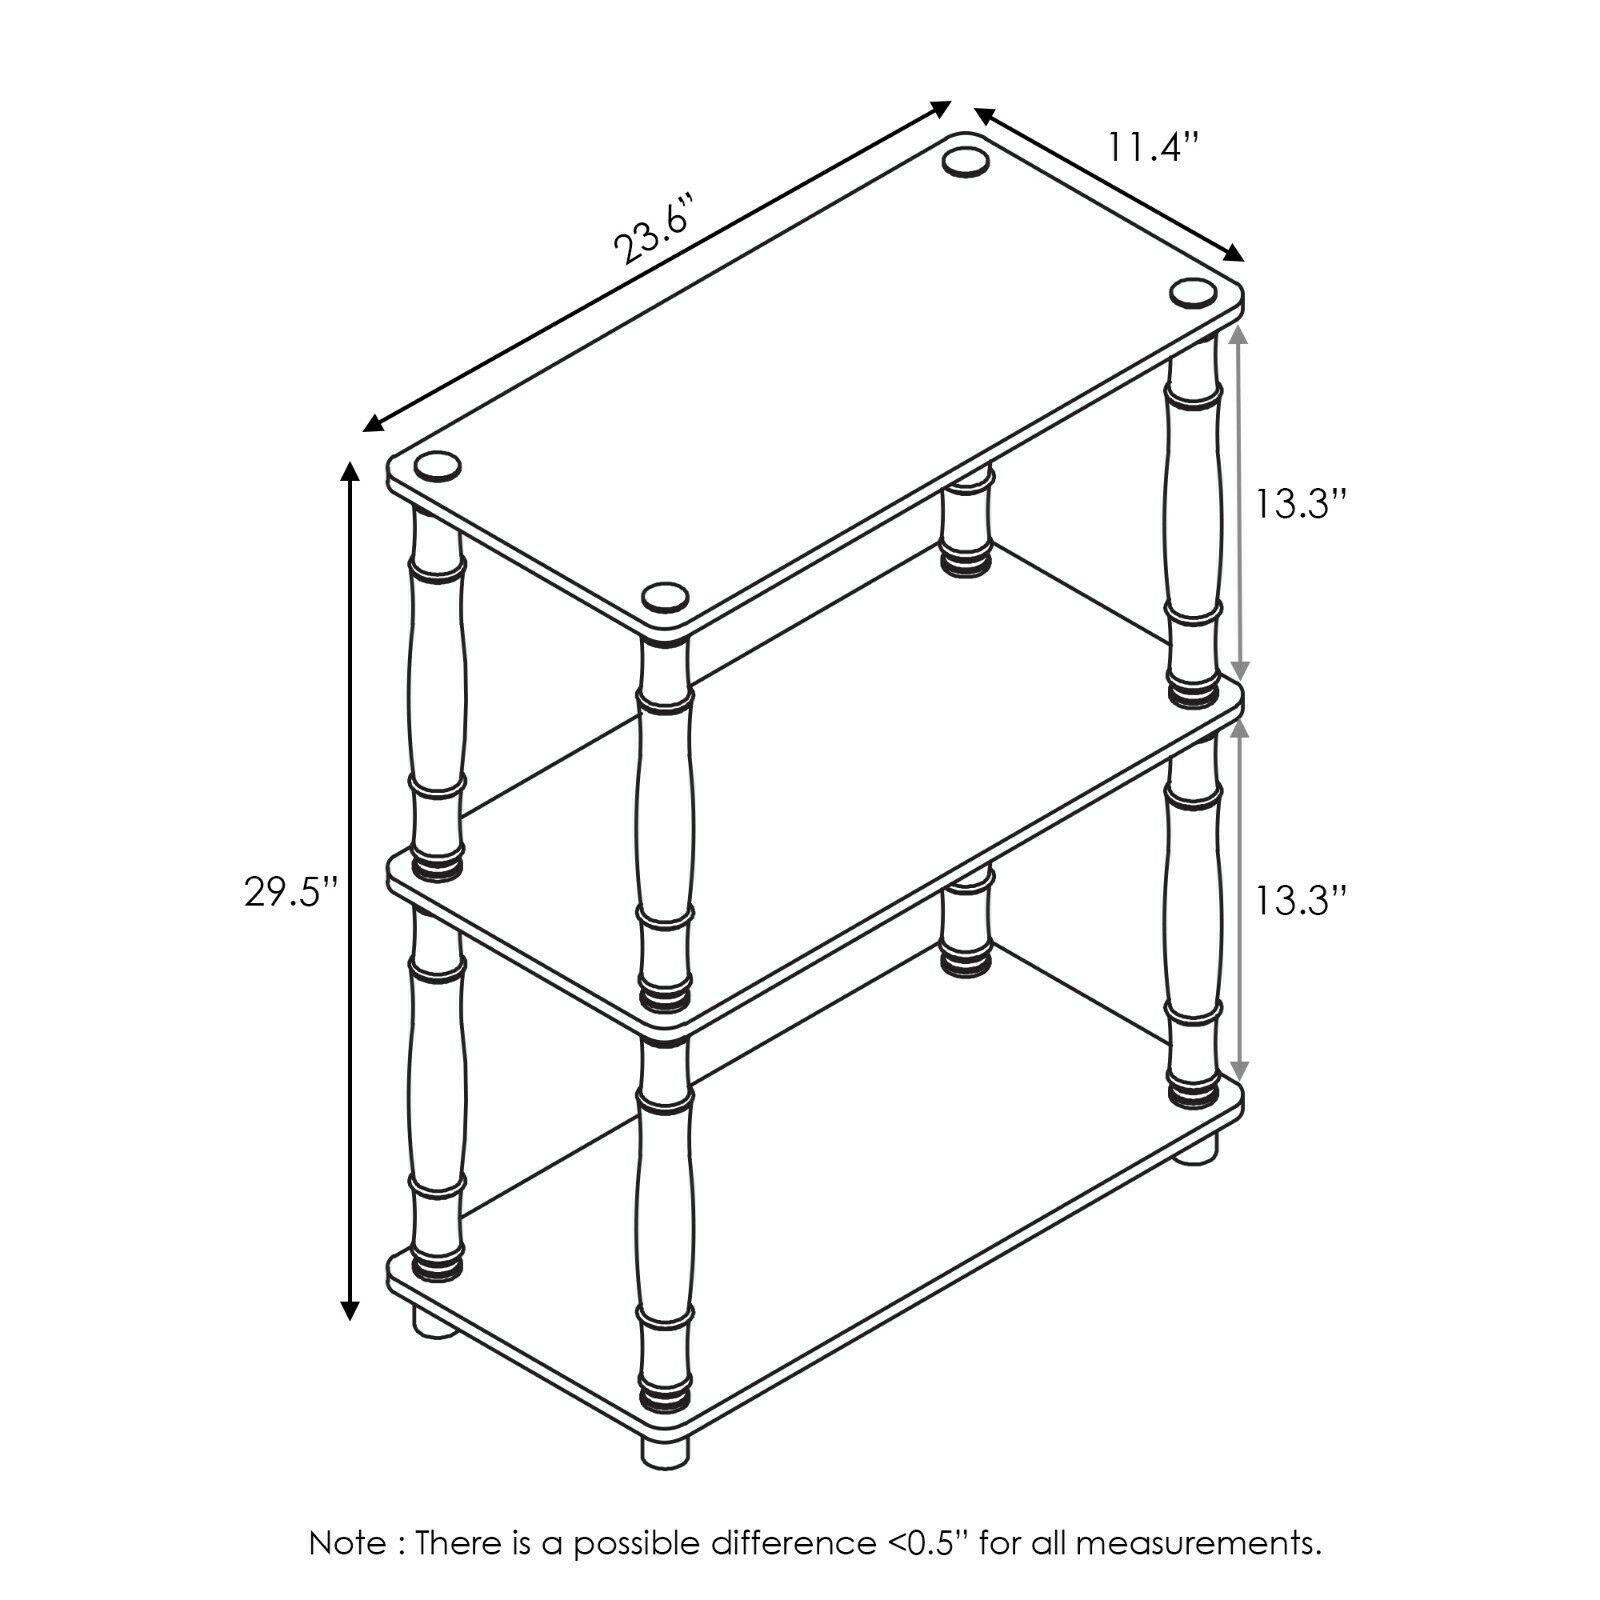 Furinno Turn-N-Tube 3-Tier Compact Multipurpose Shelf Display Rack with Classic Tube, Light Cherry/Black